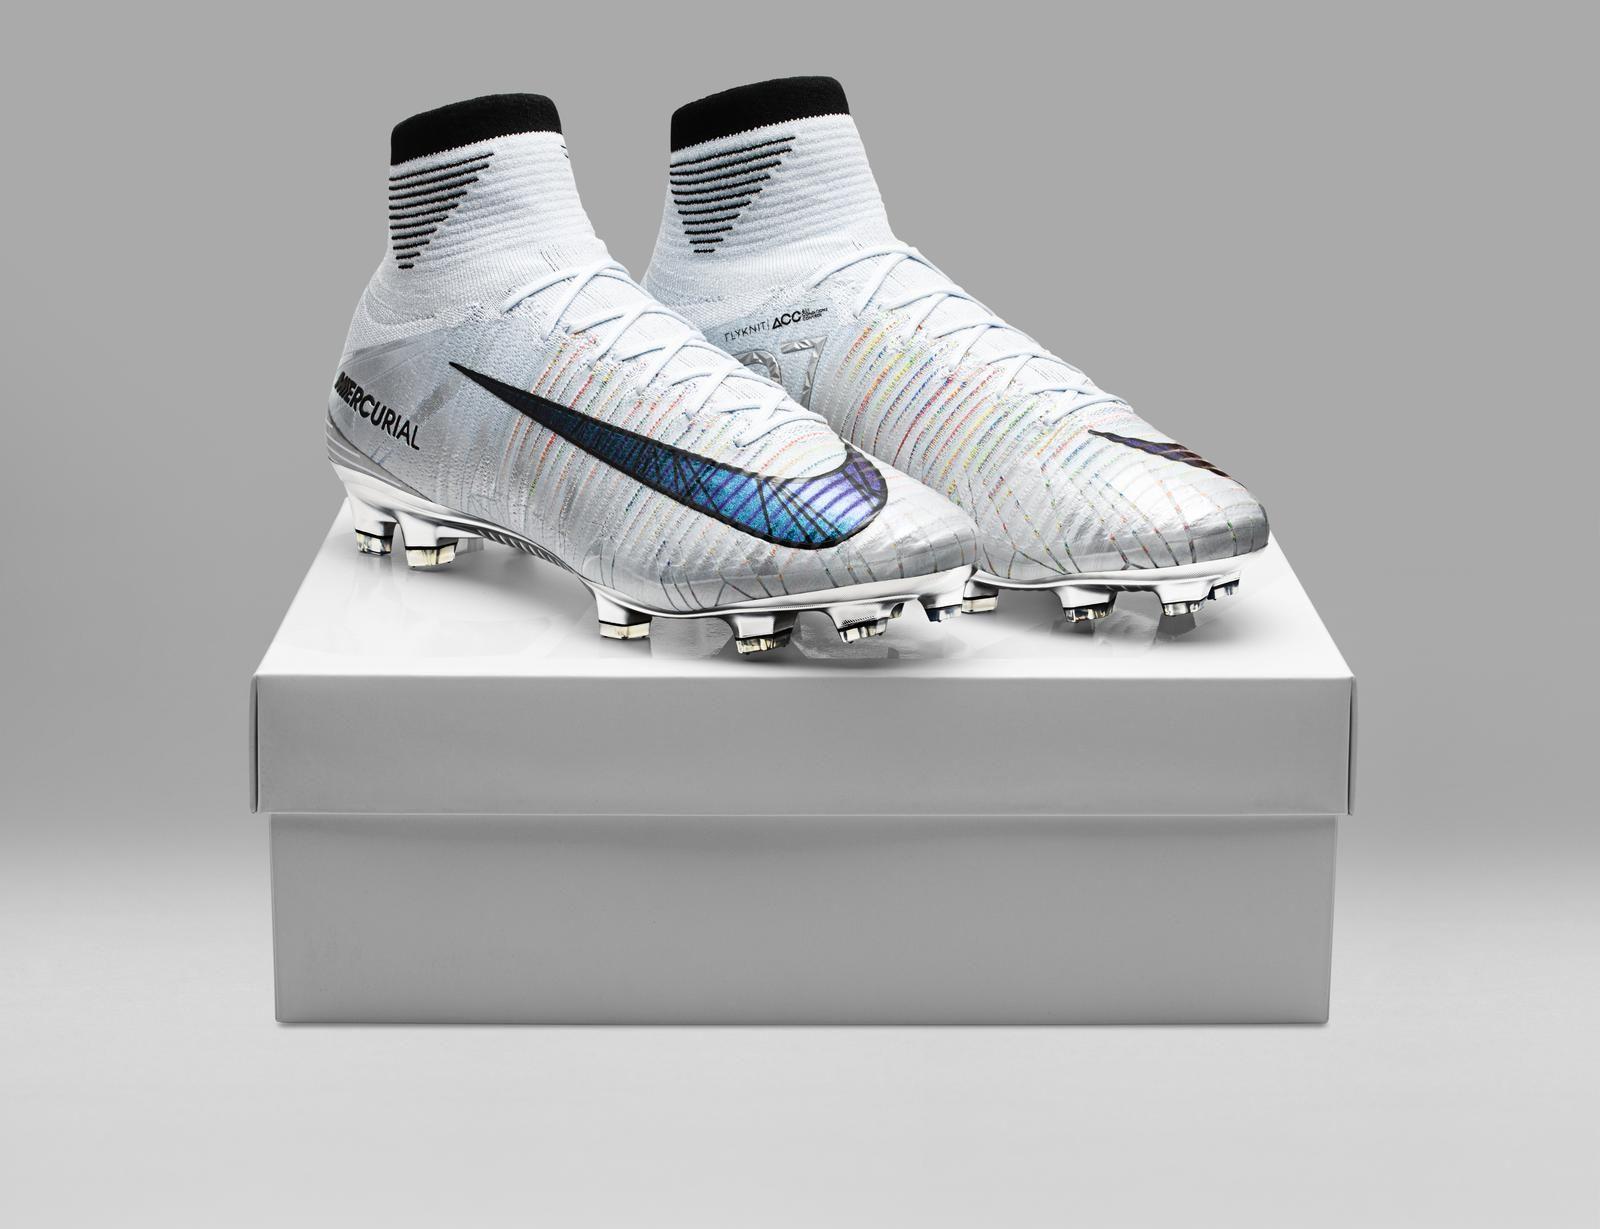 The new Nike Mercurial Superfly V CR7 Melhor boots celebrate Cristiano  Ronaldo winning the 2017 The Best award. 022f3d80eb07e